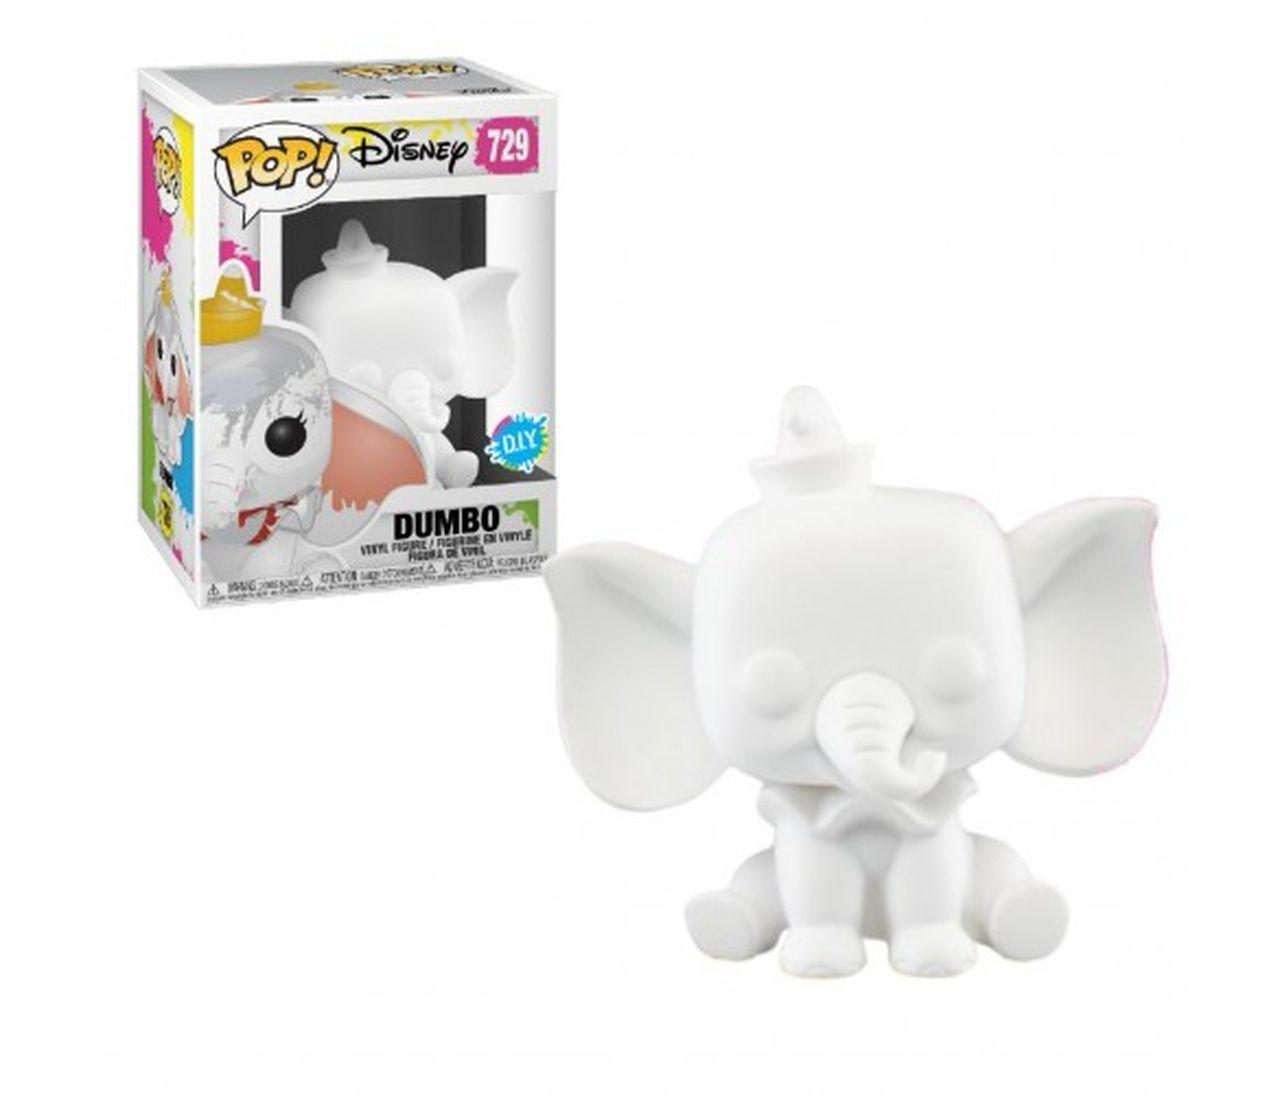 Funko Pop! Dumbo D.I.Y: Dumbo (Disney) #729- Funko